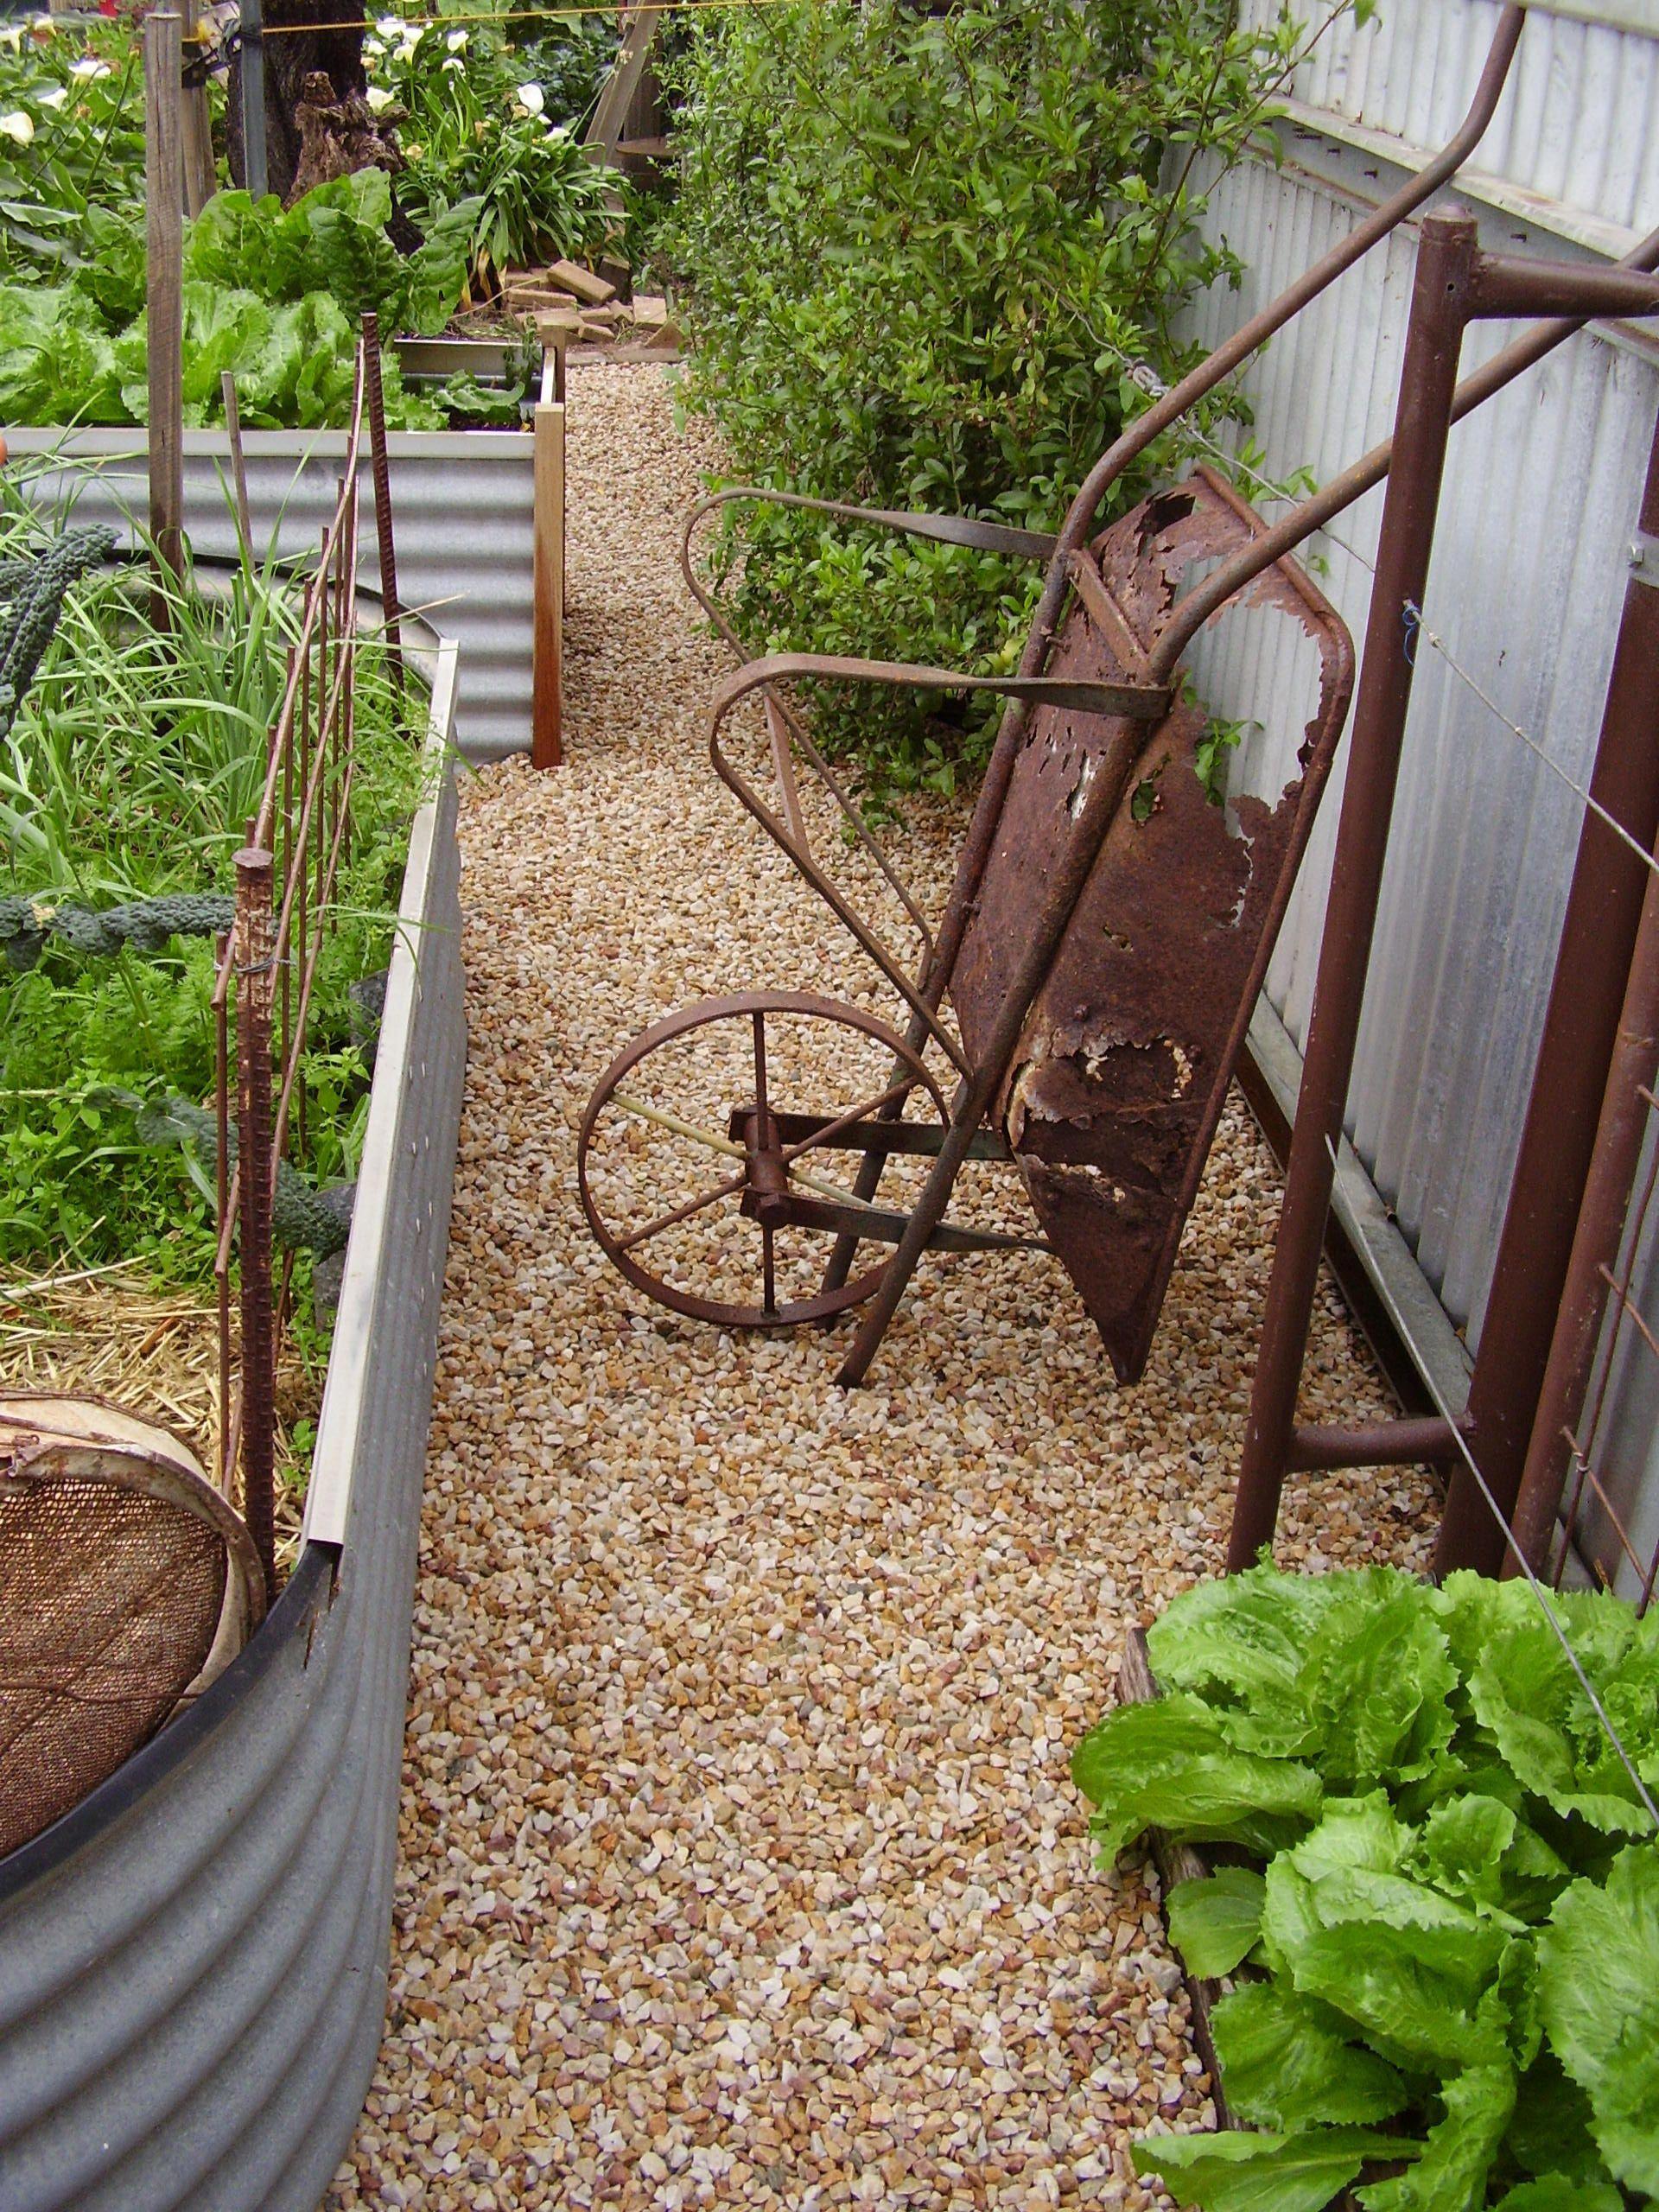 Organic Gardening Supplies Near Me